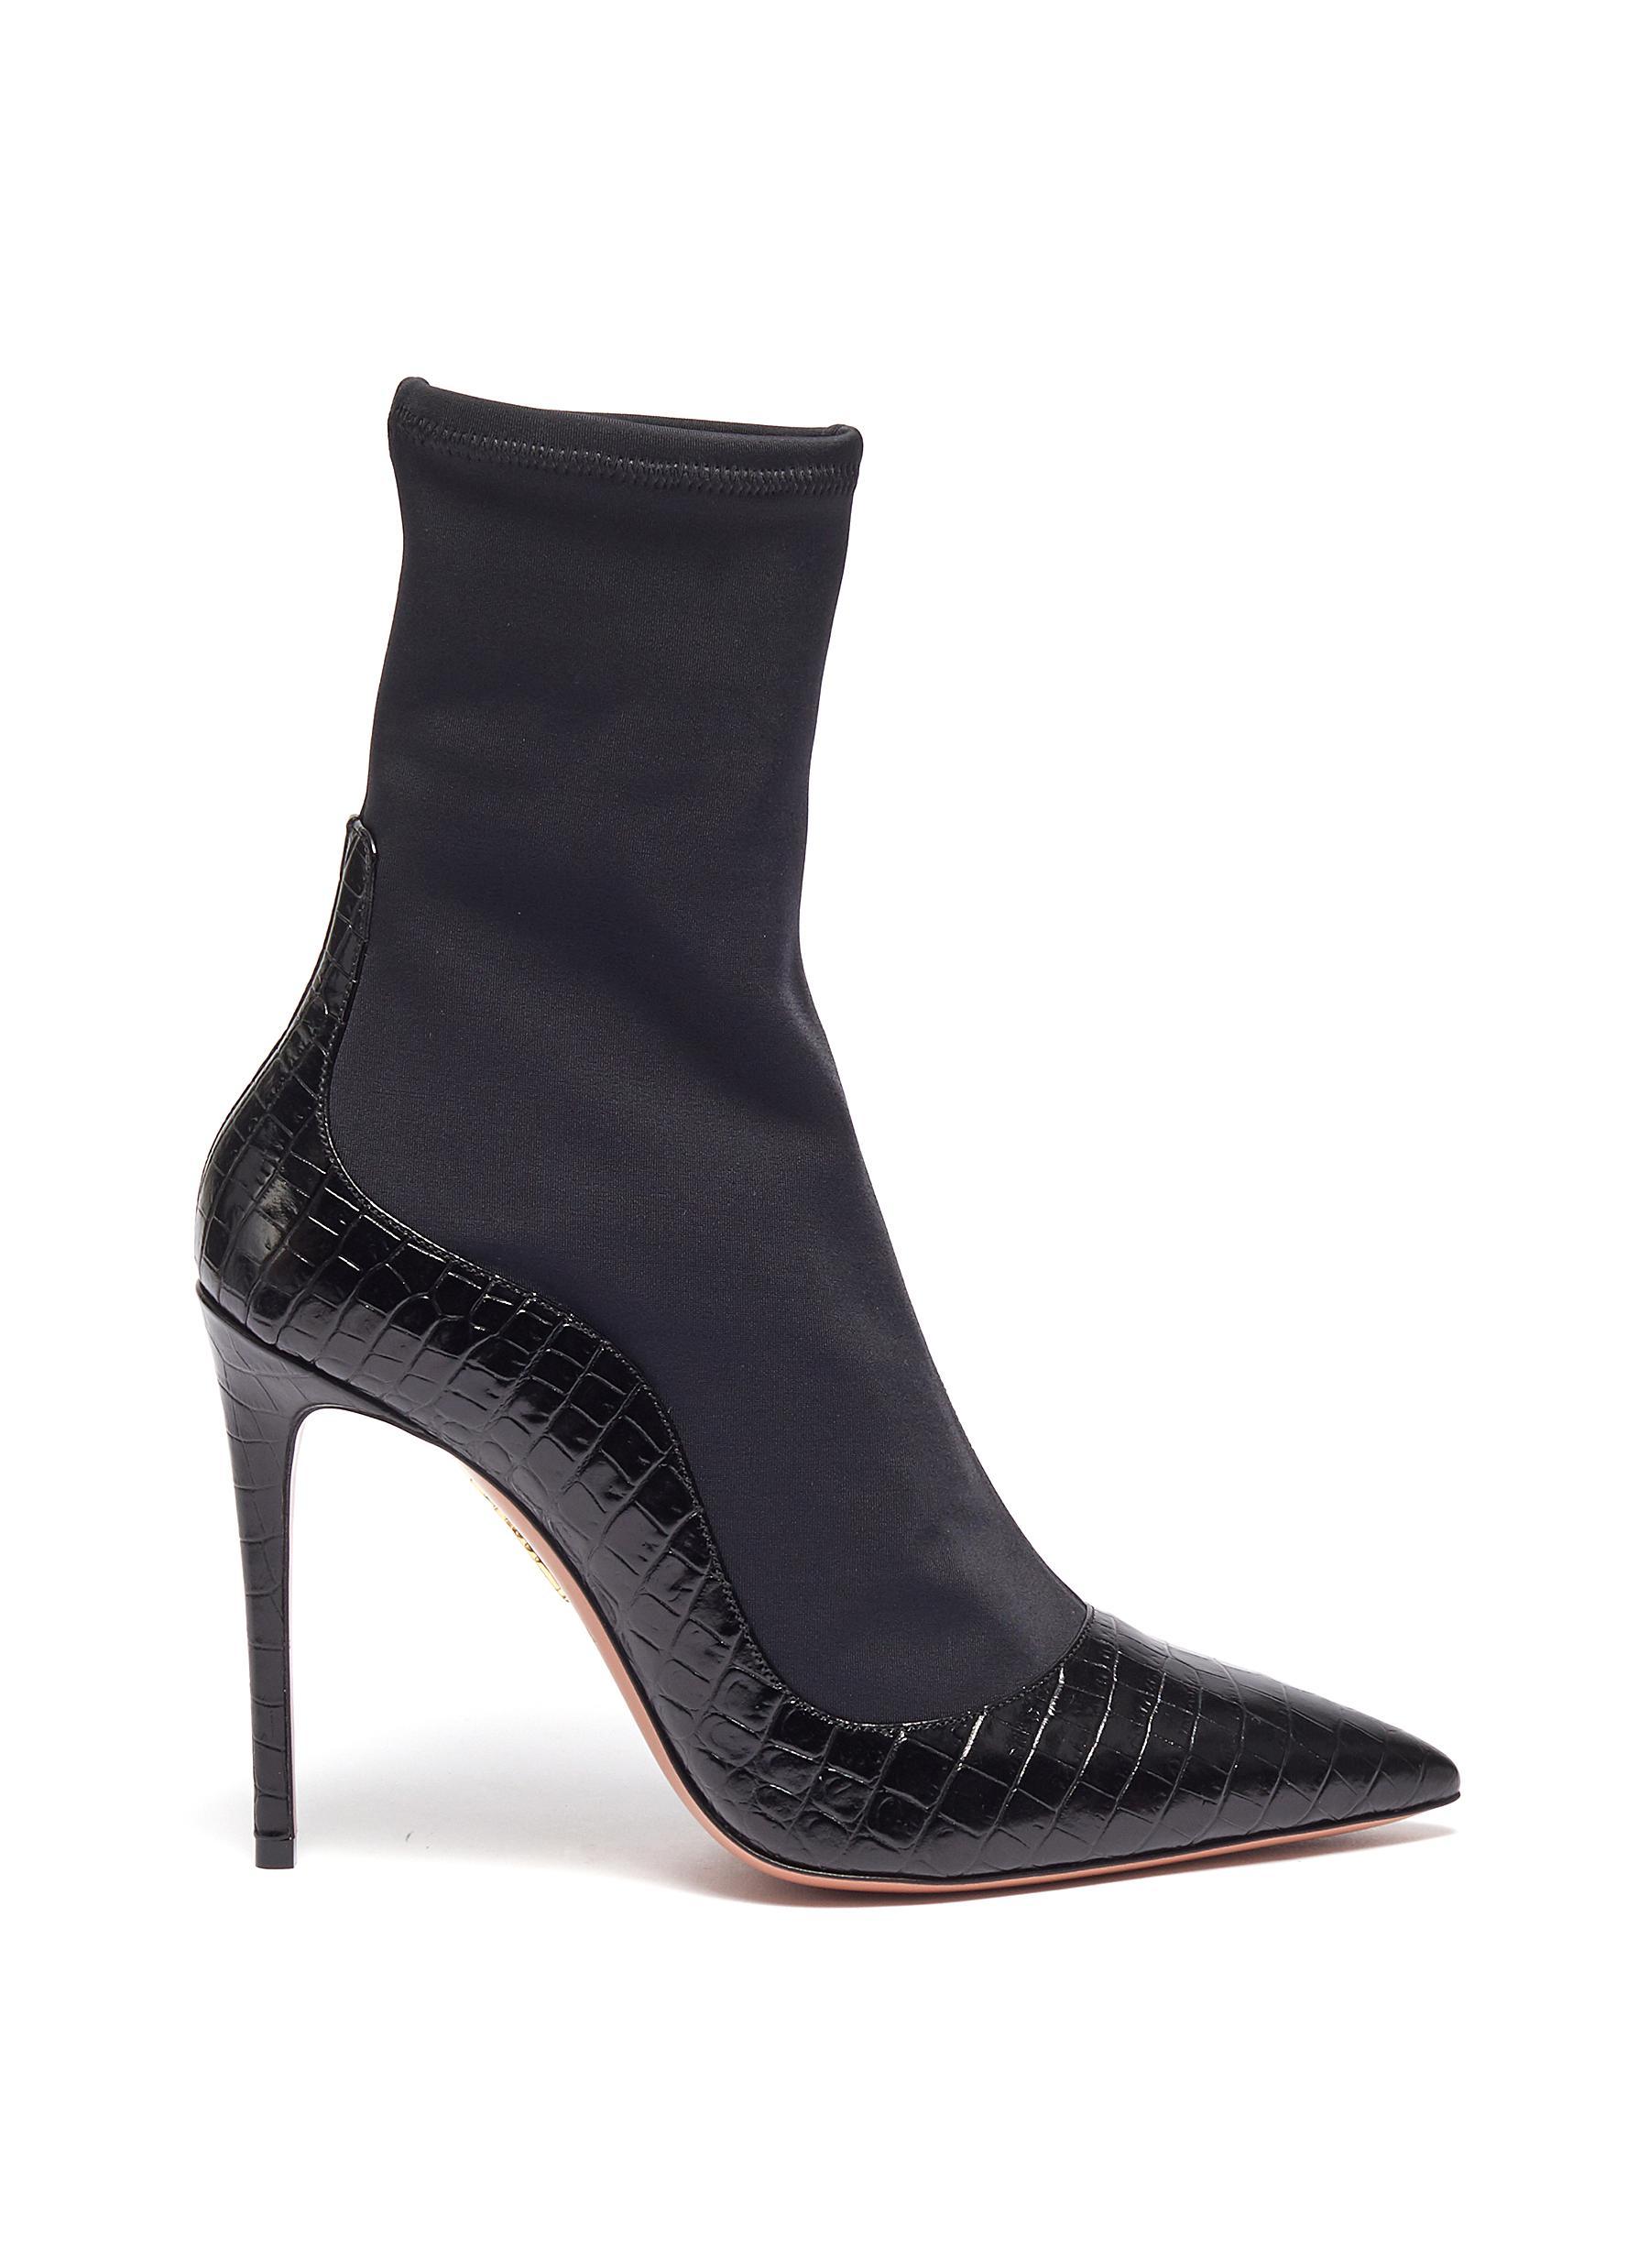 Zen croc embossed leather sock knit ankle boots by Aquazzura